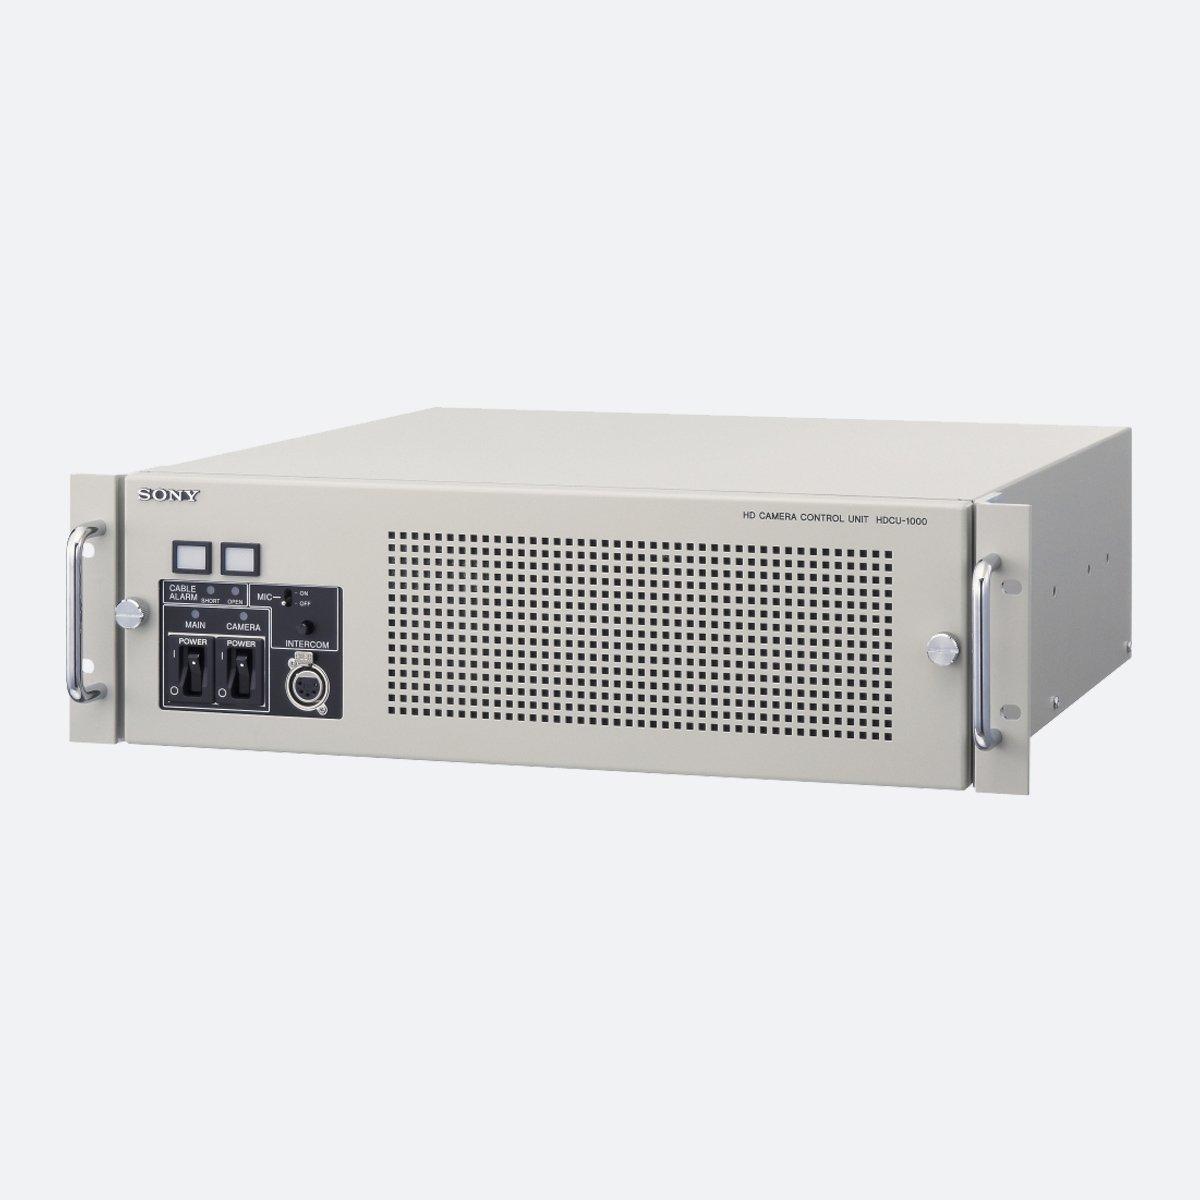 Sony HDCU-1000 HD camera control unit for HDC-1500 cameras